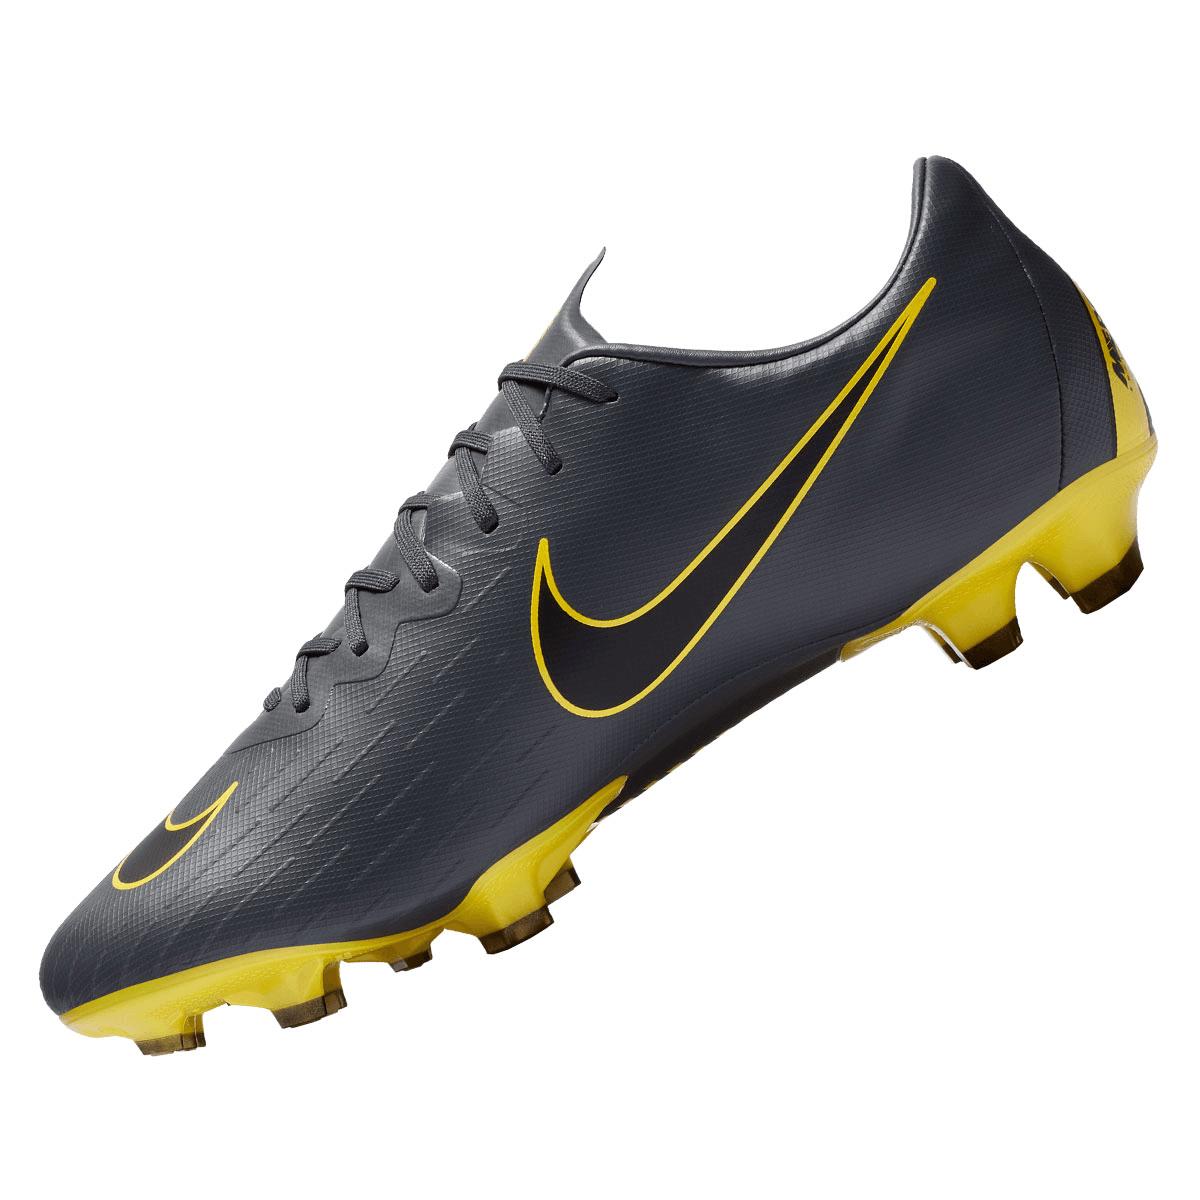 Nike Fußballschuh Mercurial Vapor XII Pro FG dunkelgraugelb